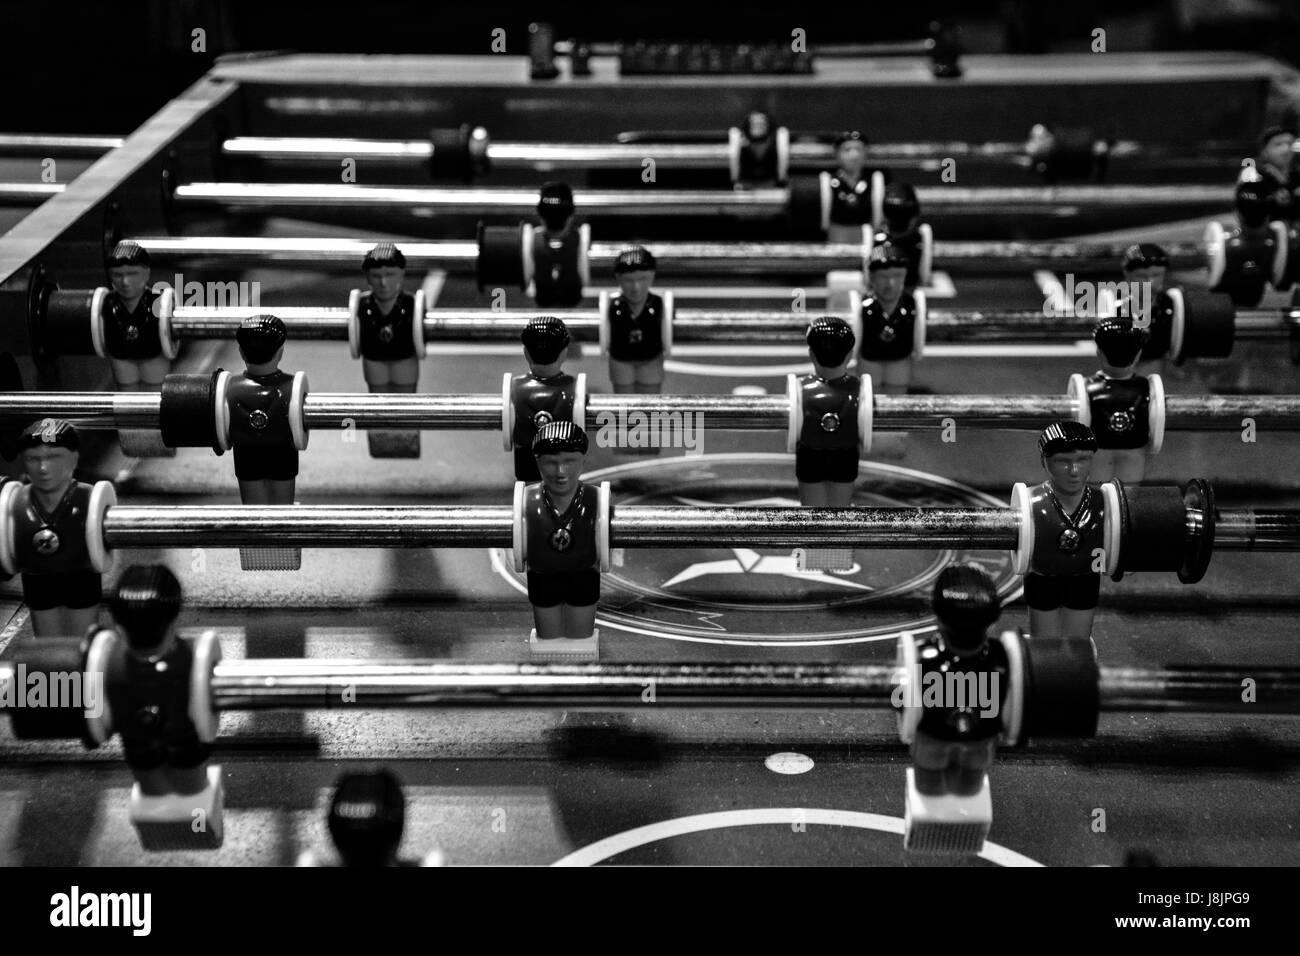 Foosball Table - Stock Image